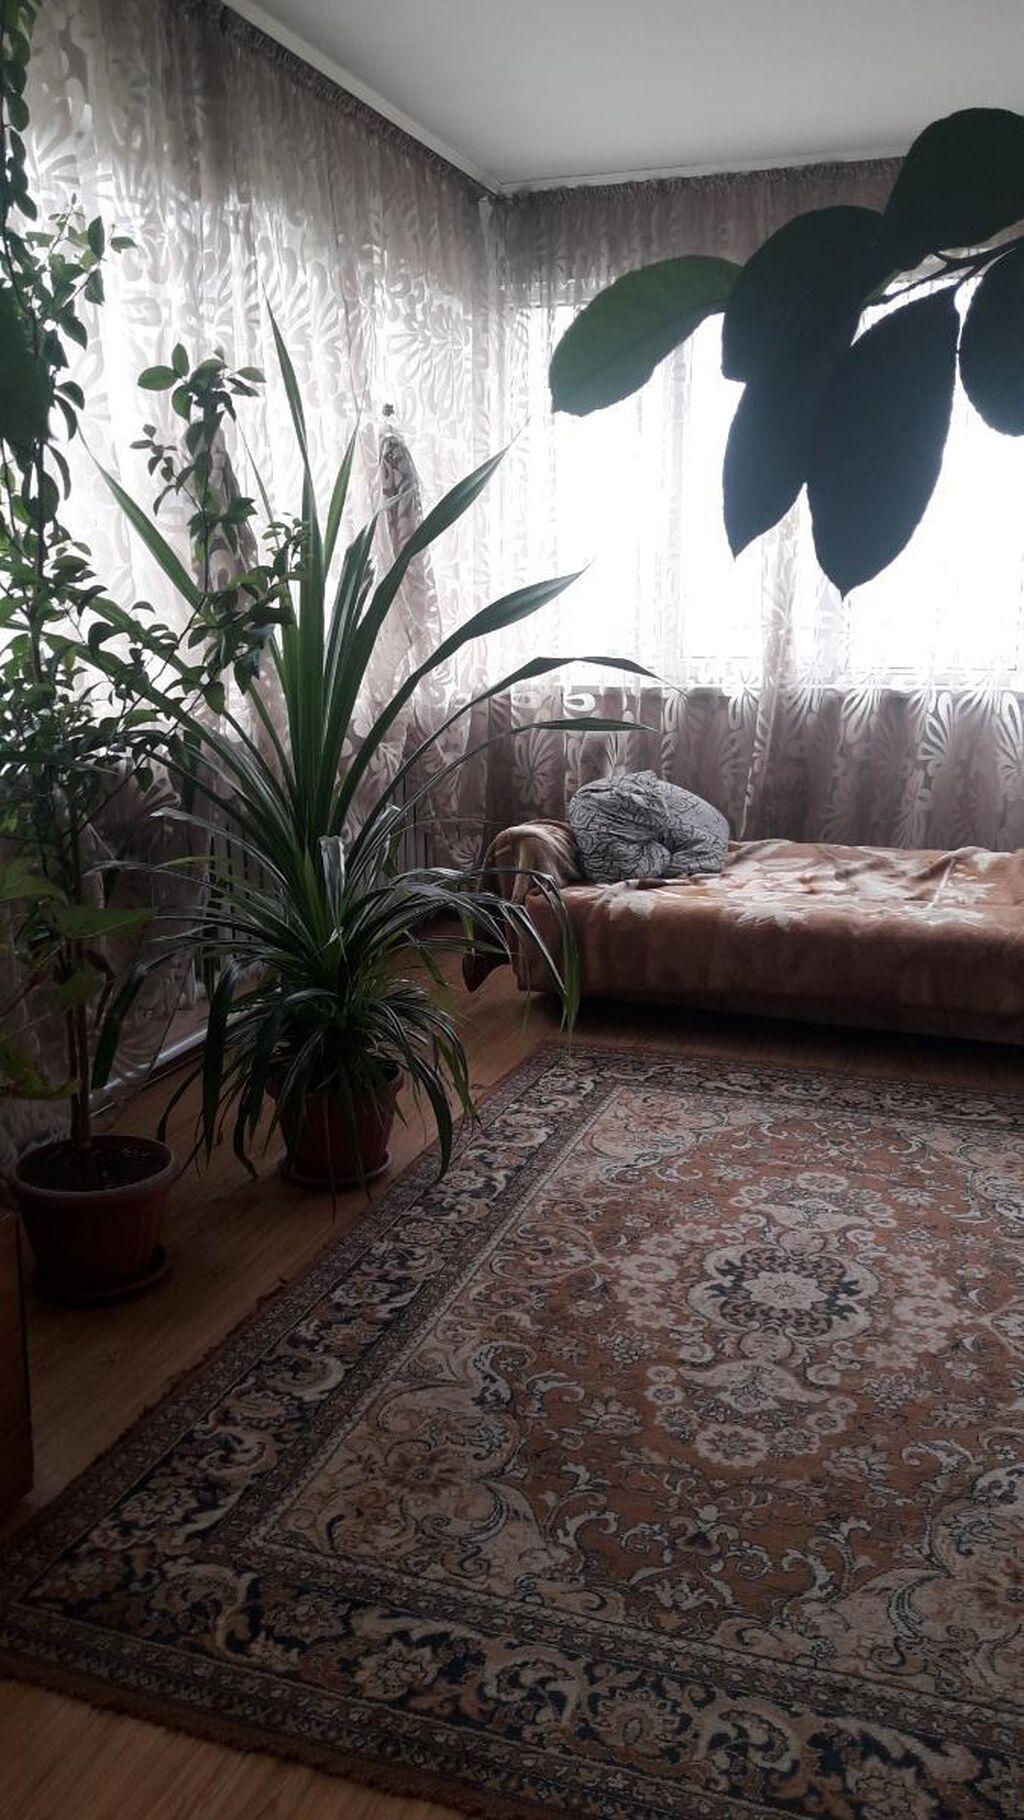 Продам Дома от собственника: 178 кв. м, 5 комнат